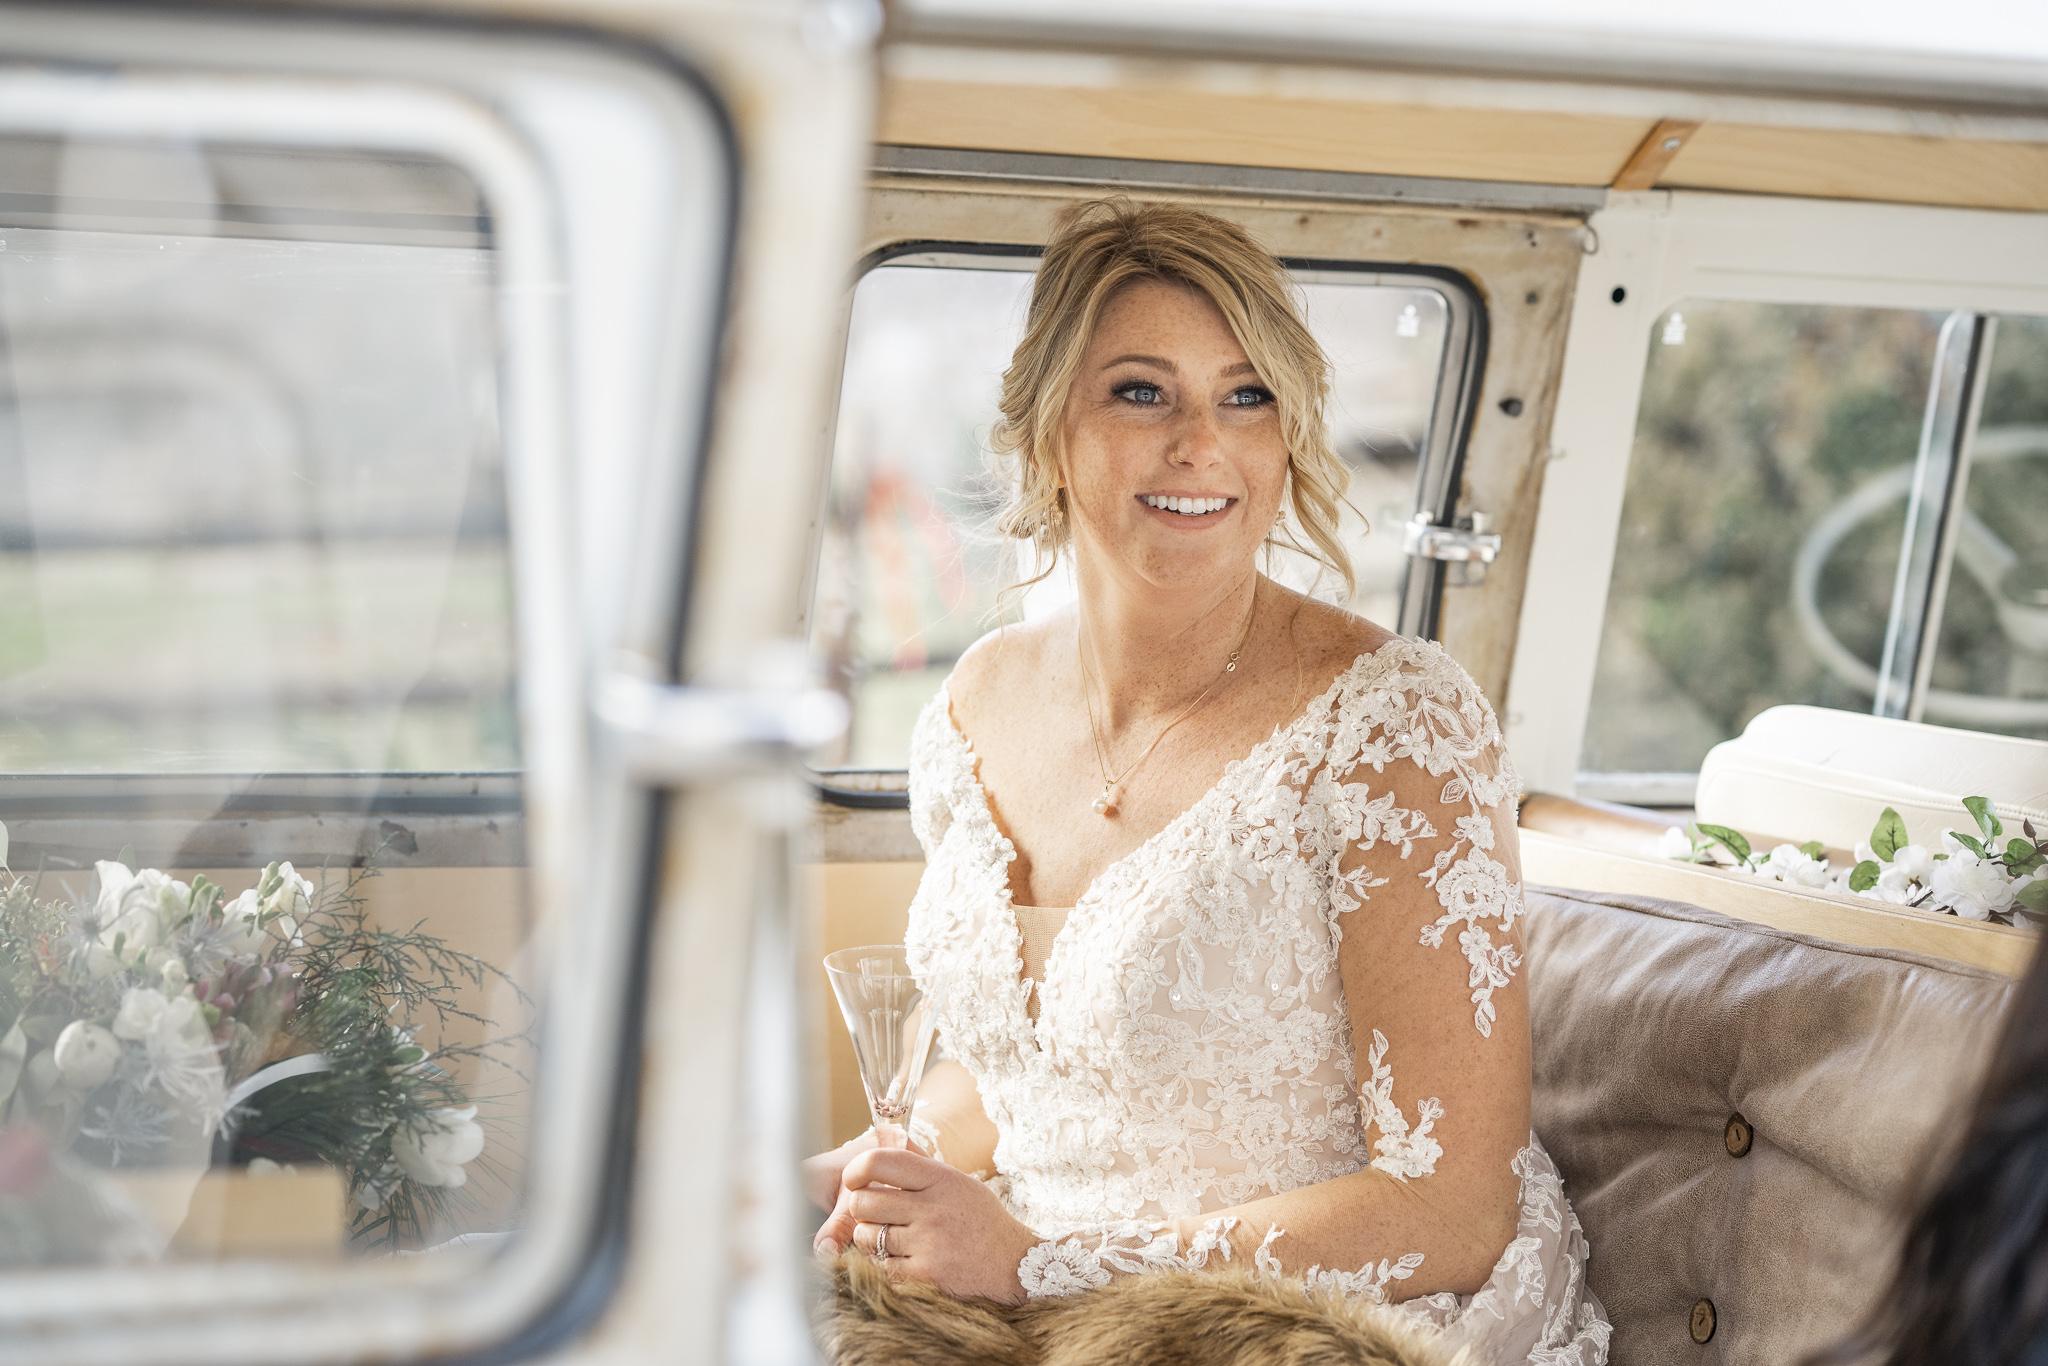 Iron-Oak-Studios-bride-VW-wedding.jpg